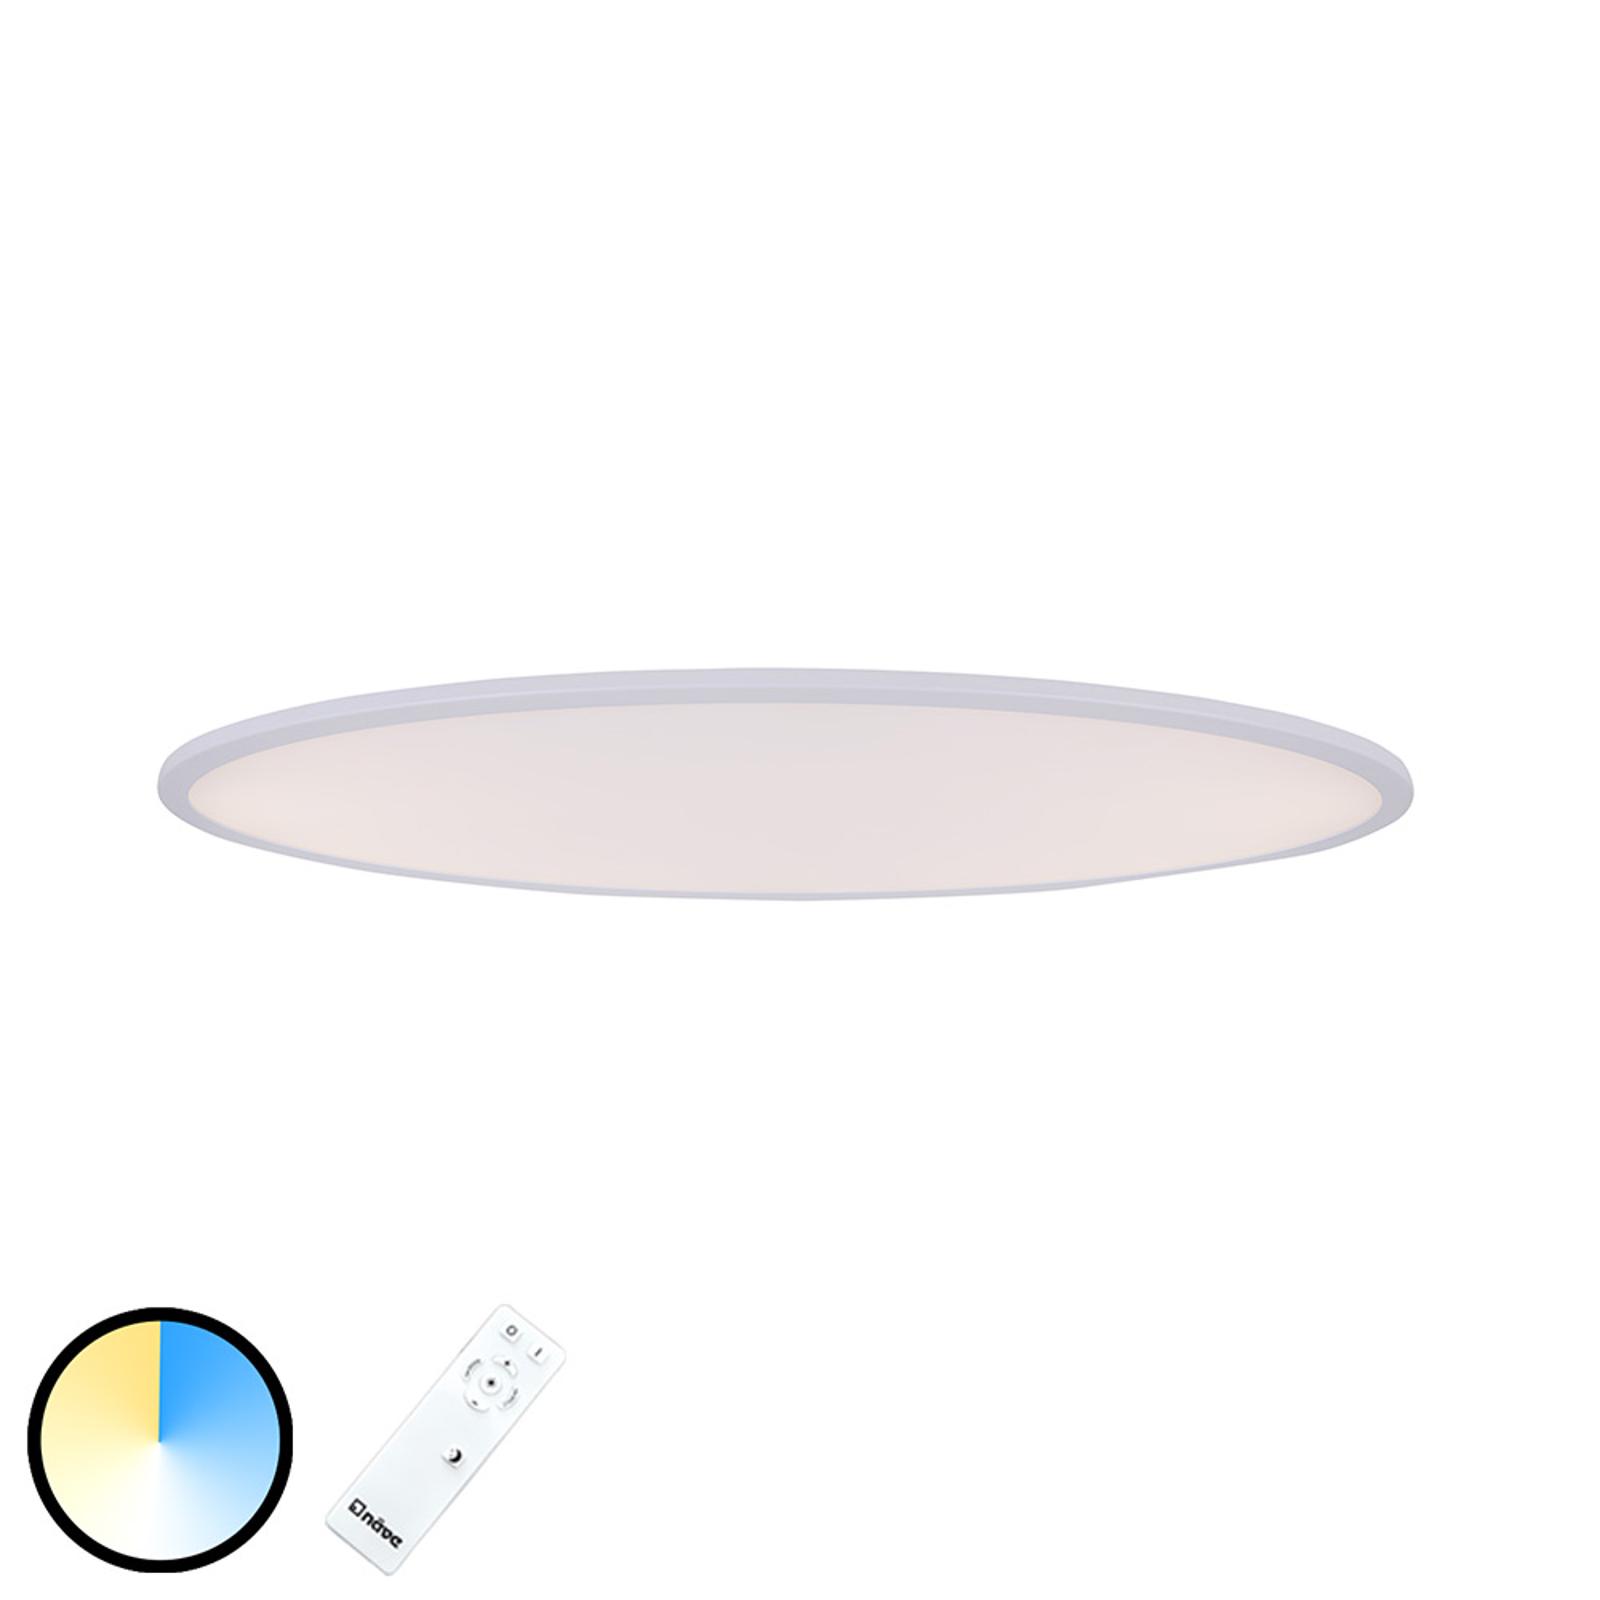 LED plafondlamp Amalfi ovaal 100 cm x 40 cm